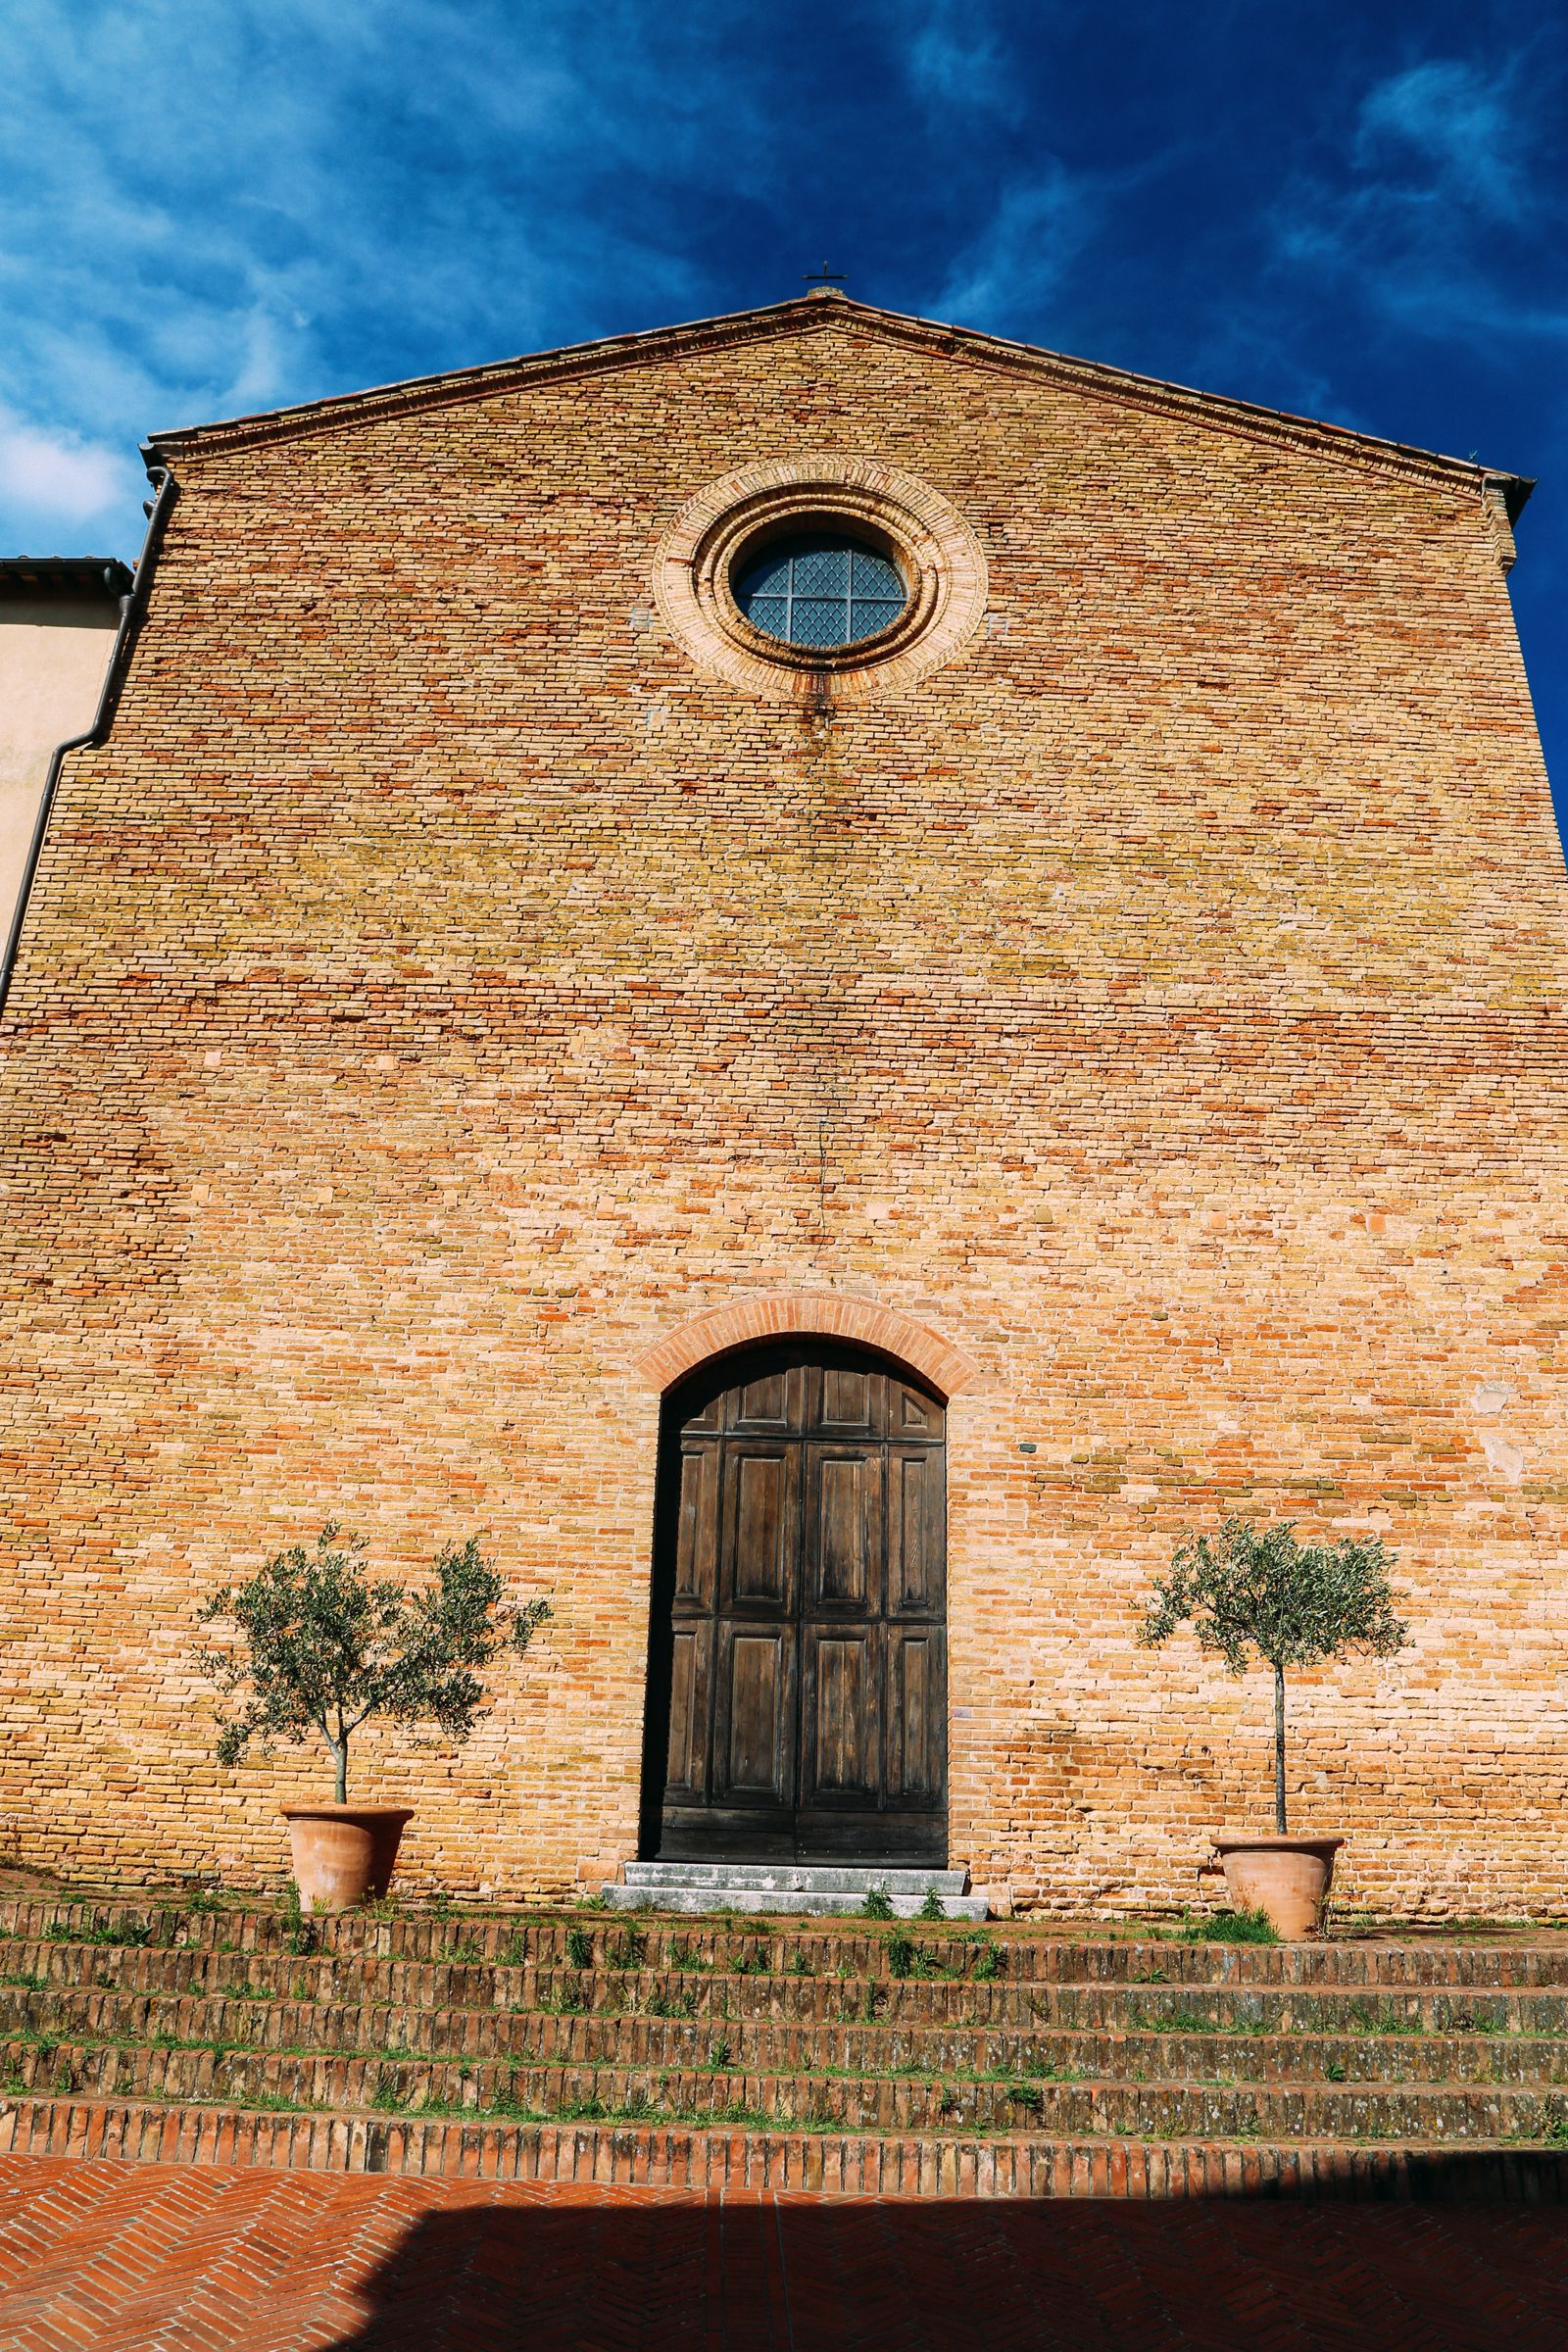 The Beautiful Italian Town Of San Gimignano (17)